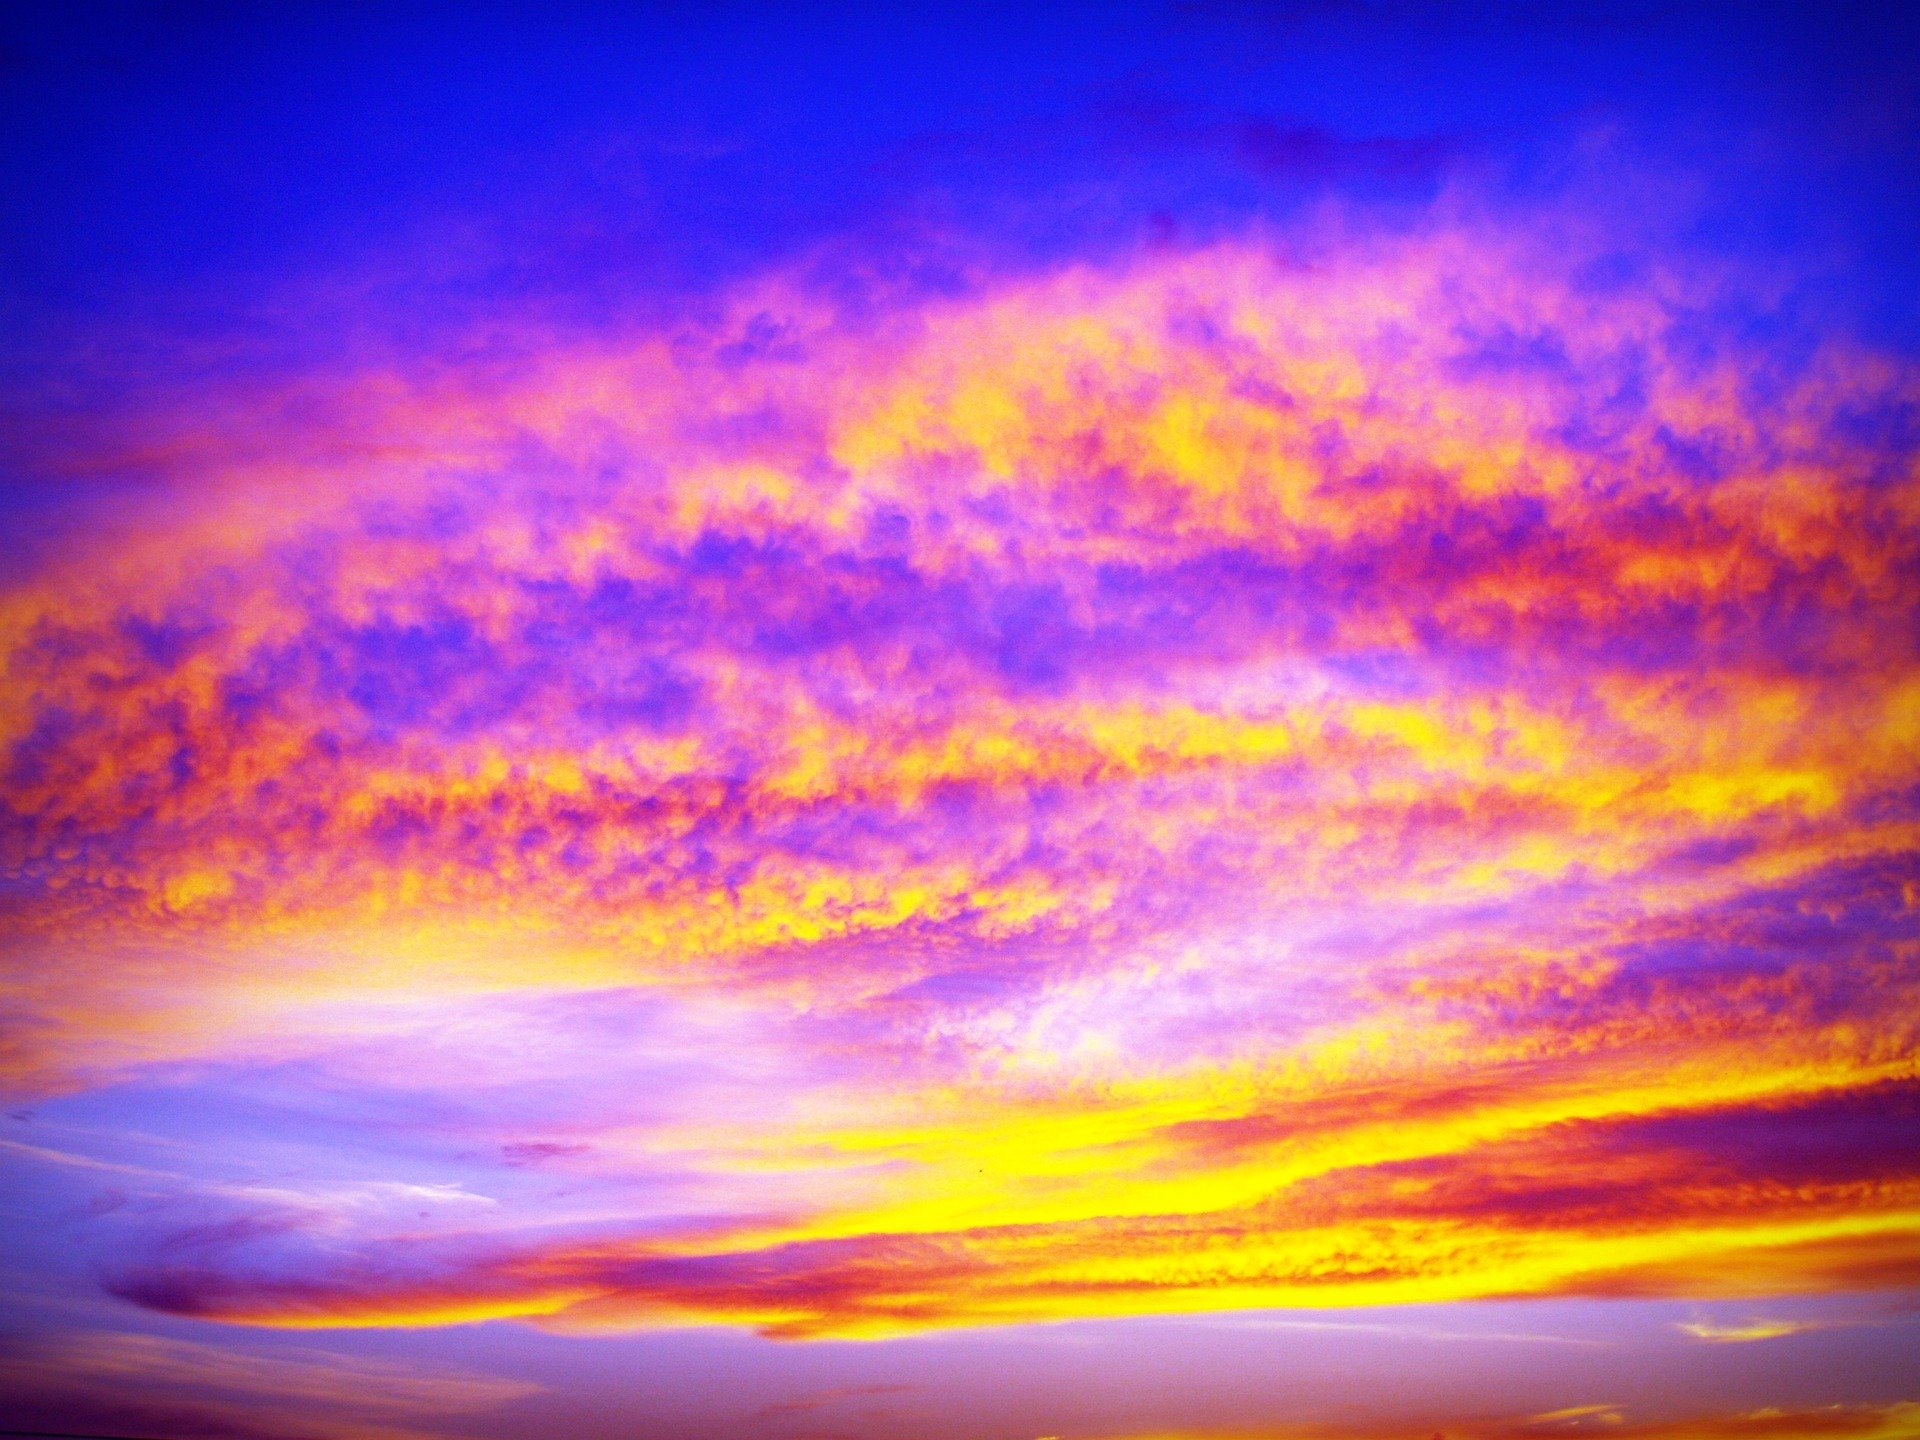 sunset-1551323_1920